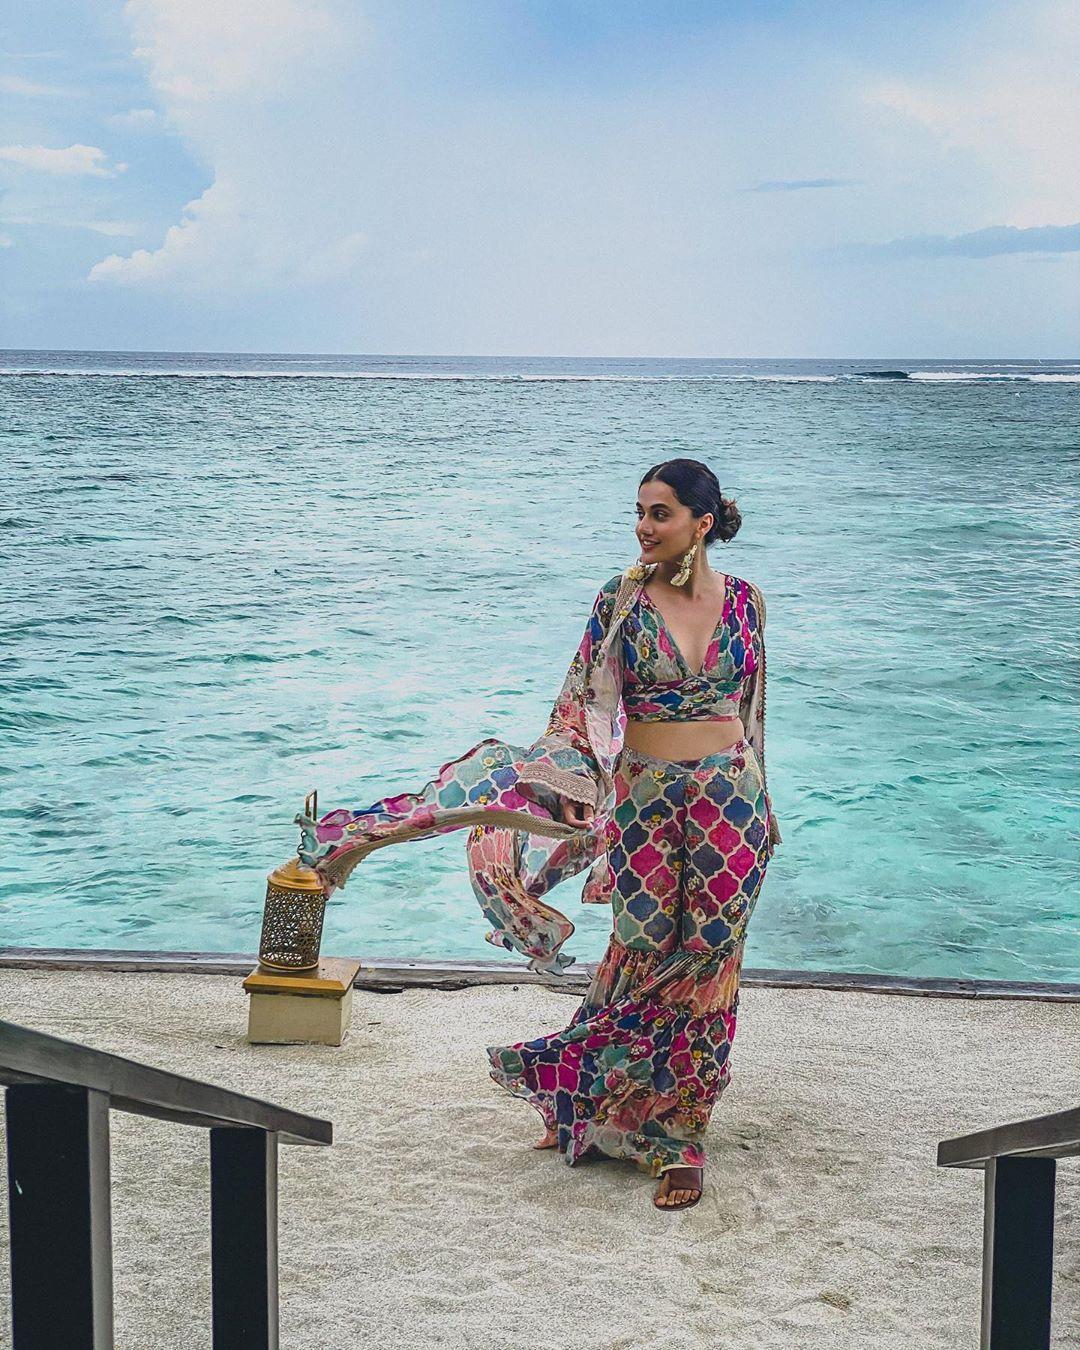 Taapsee Pannu's tropical parody vibes and summery resort wear leave Neena Gupta impressed